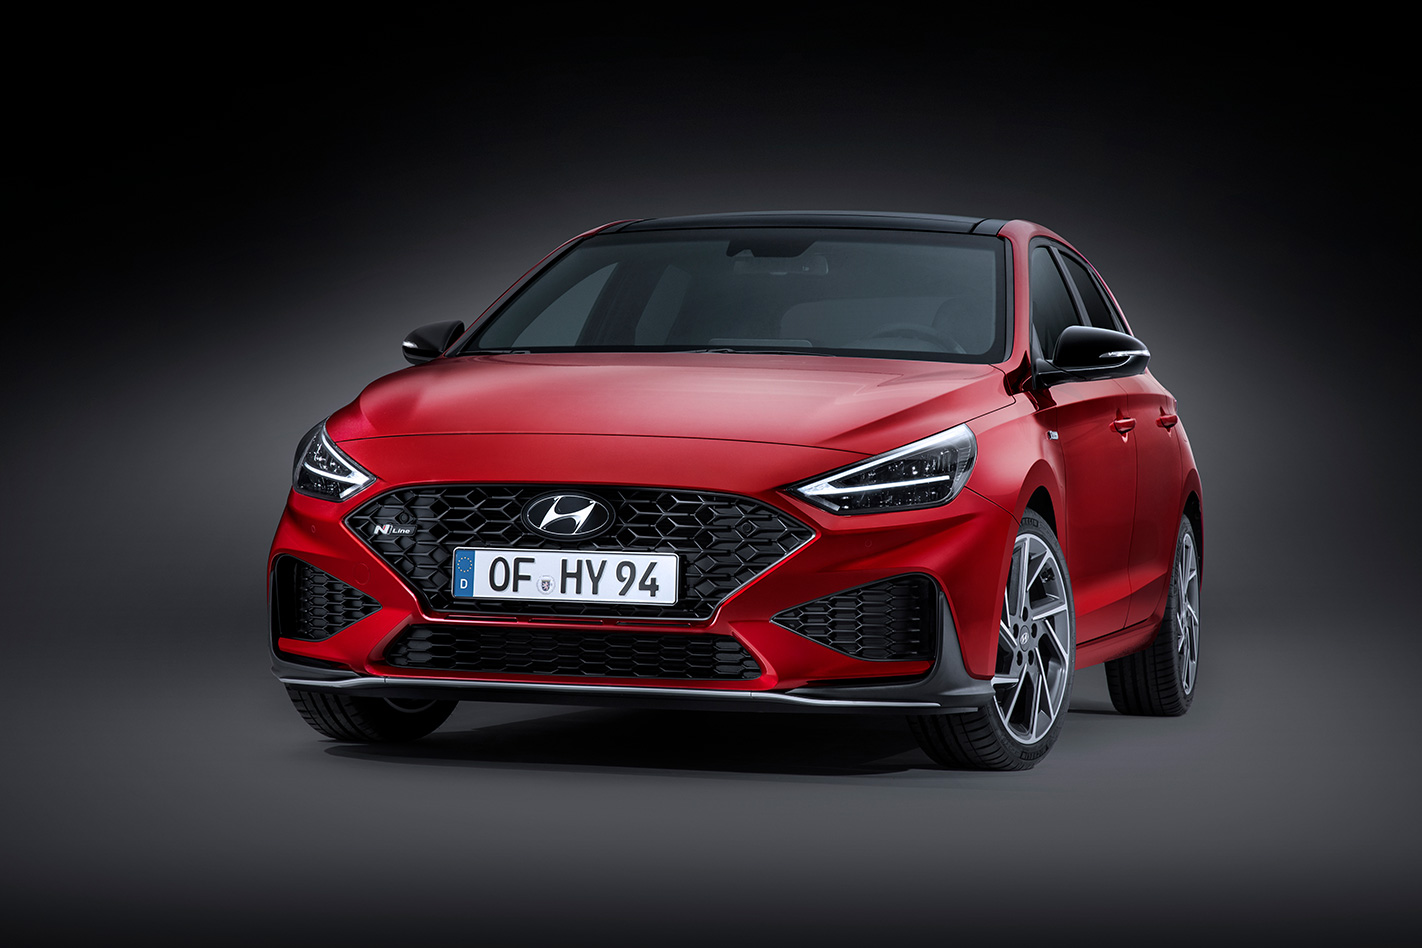 2021 Hyundai i30 N-Line Europe